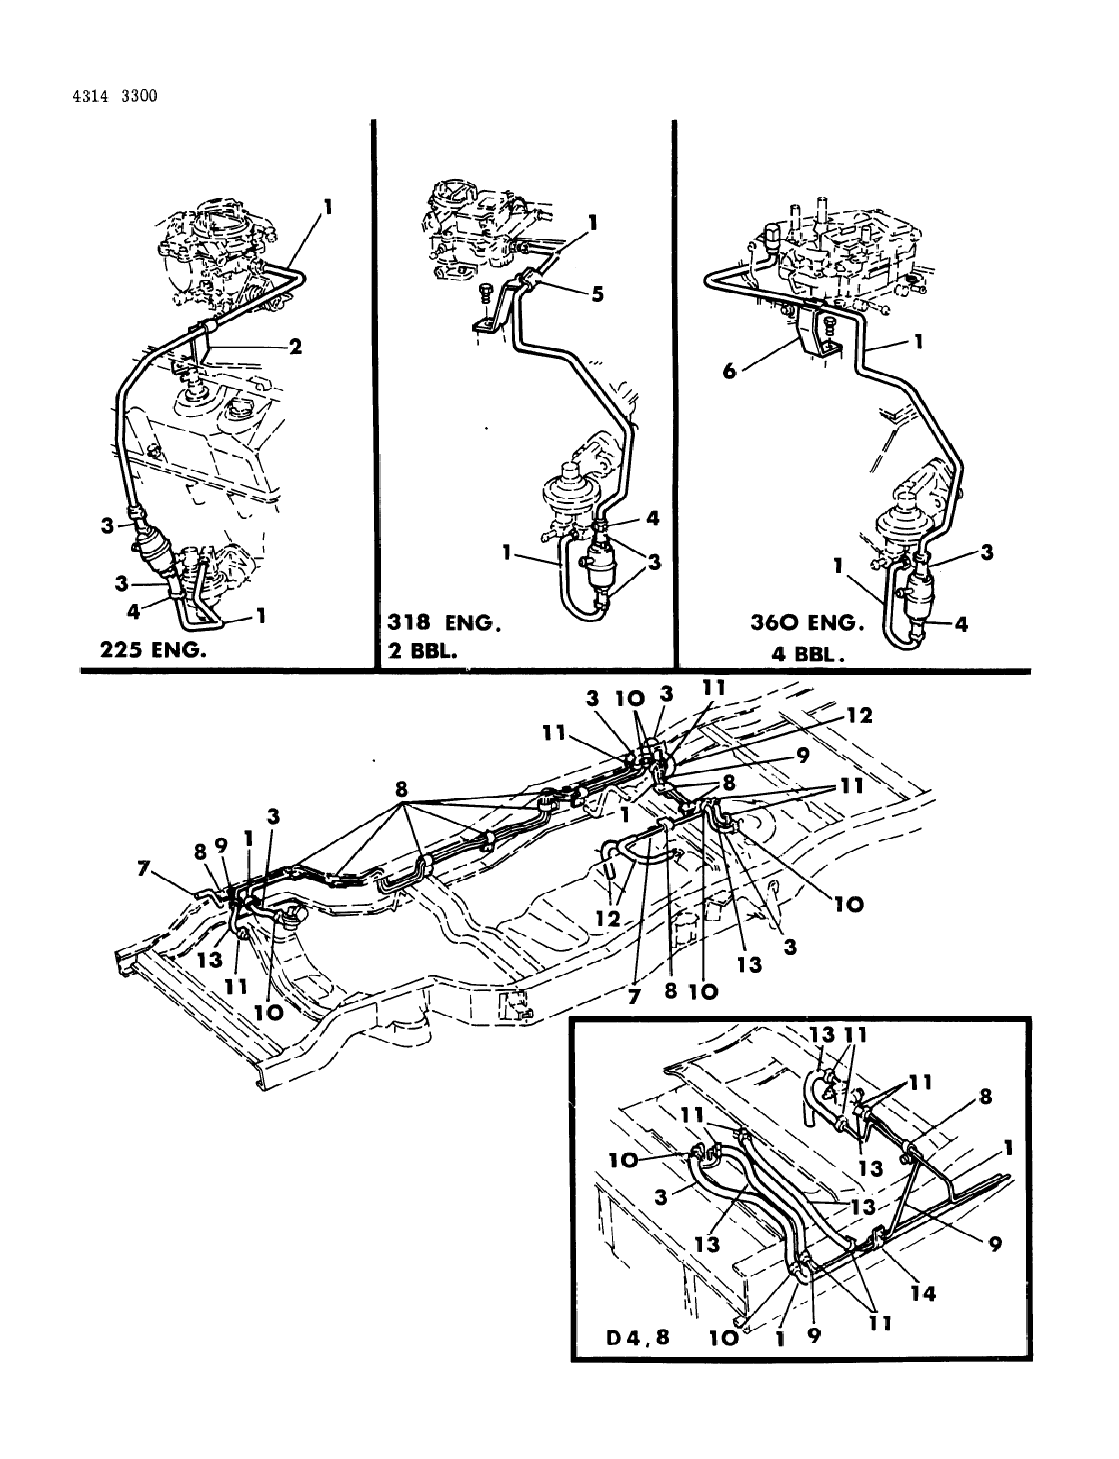 318 Engine Fuel Line Diagram